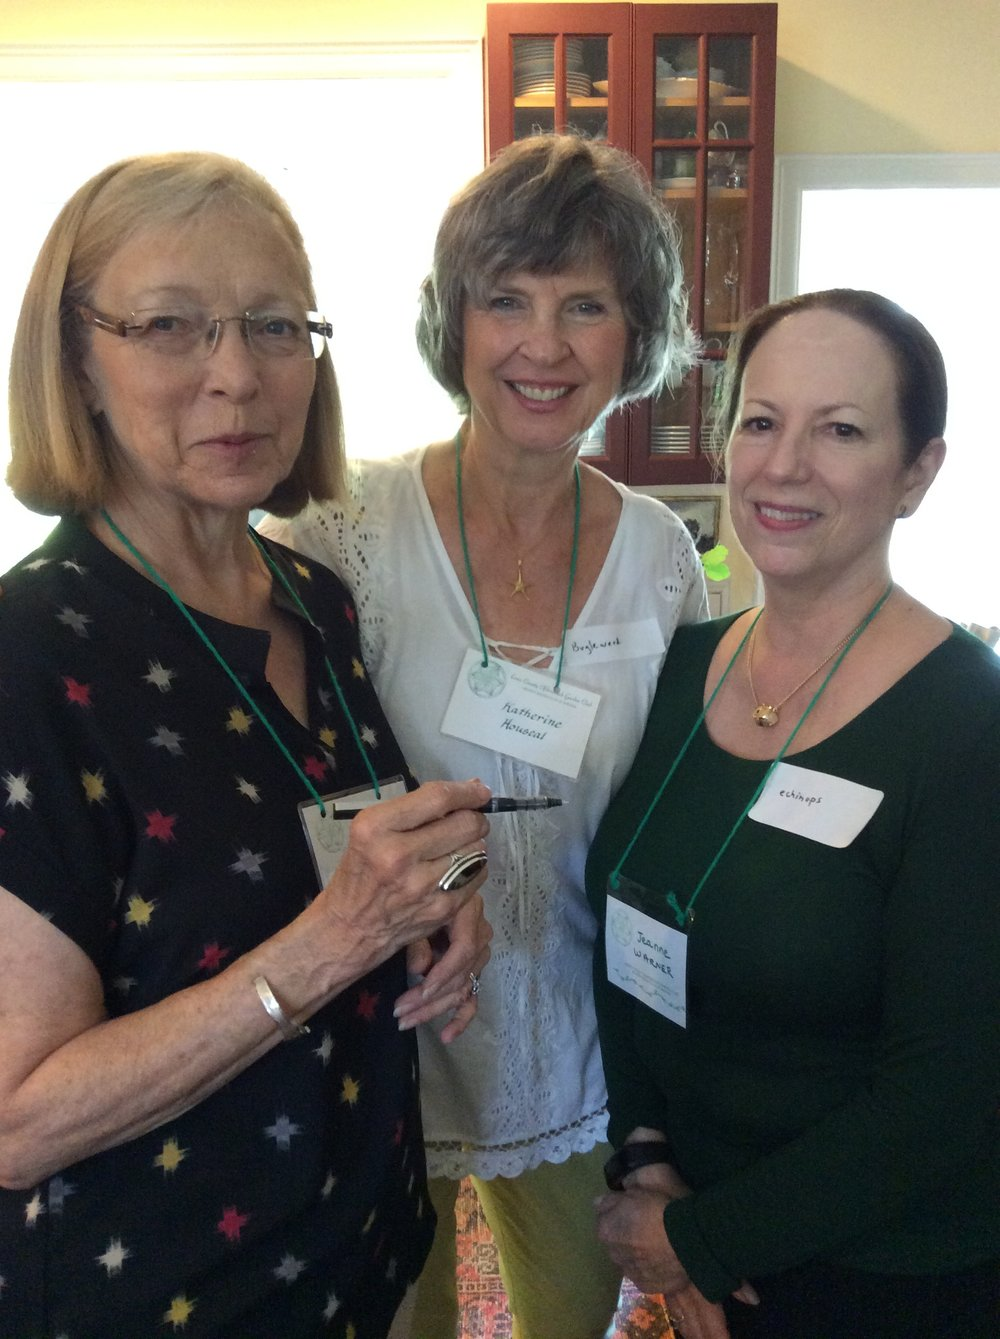 Carol, Katherine, and Jeanne